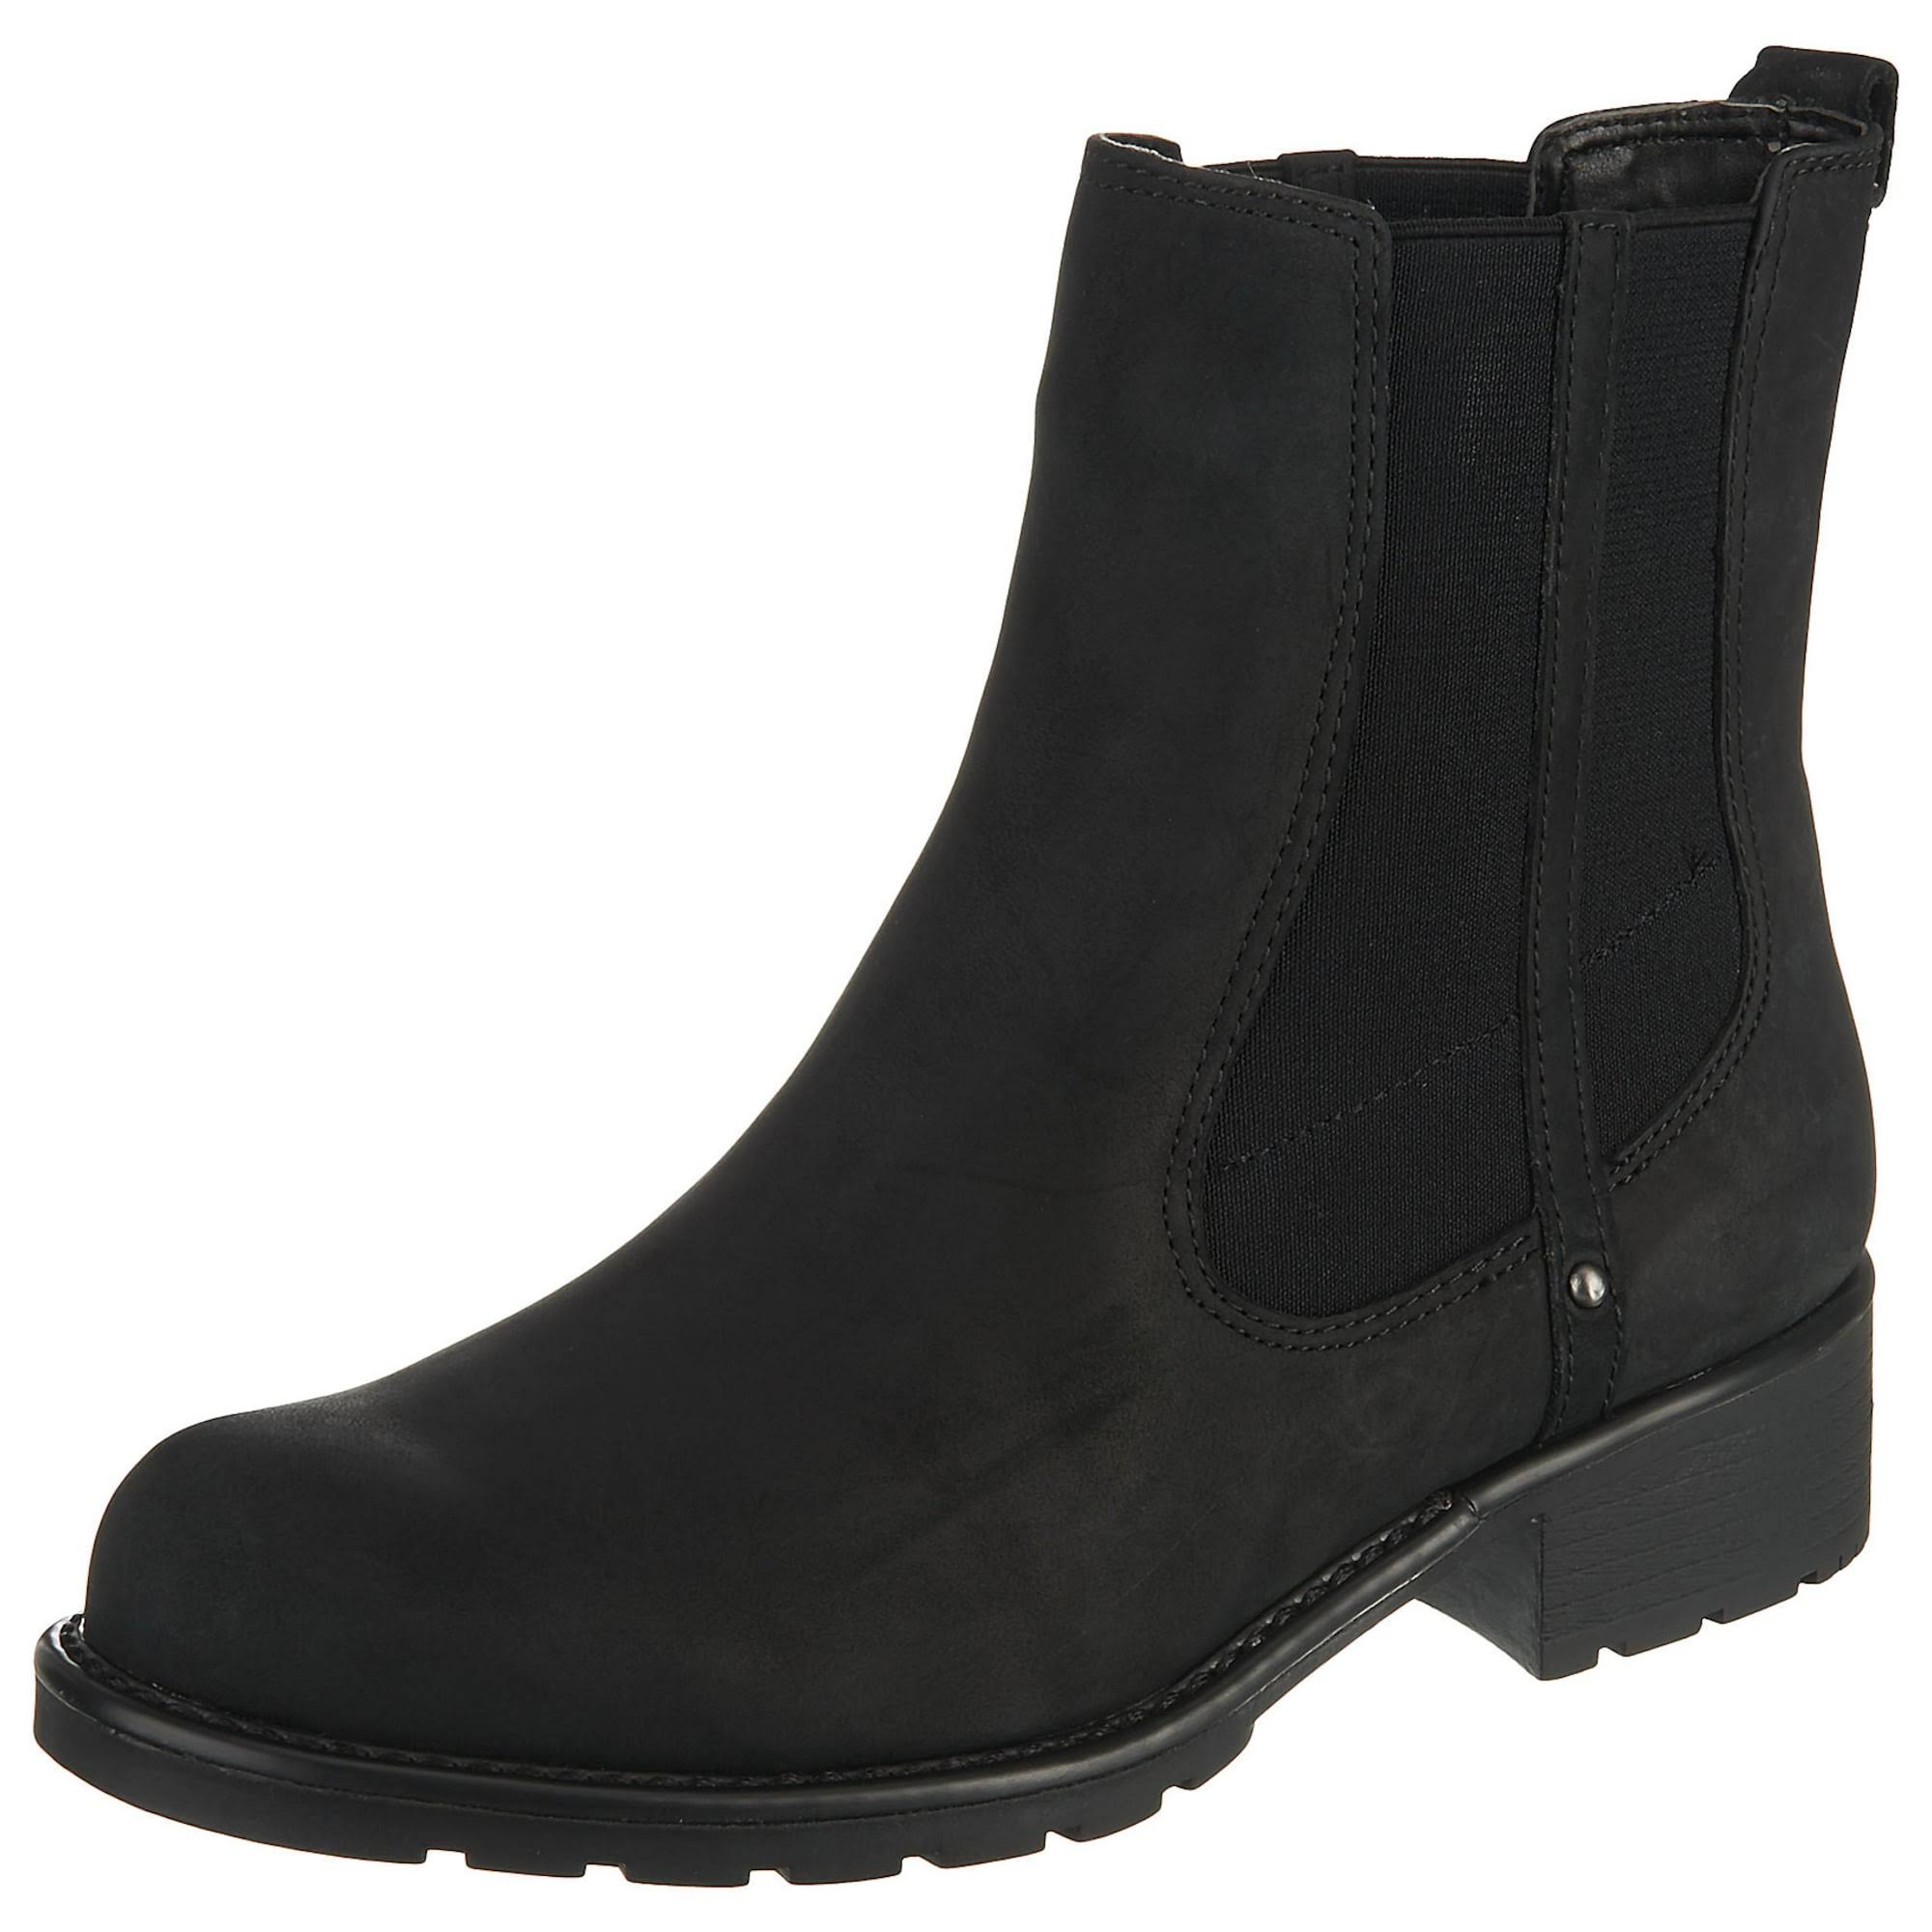 Boots ClarksLadies 'orinoco Club'Nero 'orinoco ClarksLadies Boots gIYf67yvb